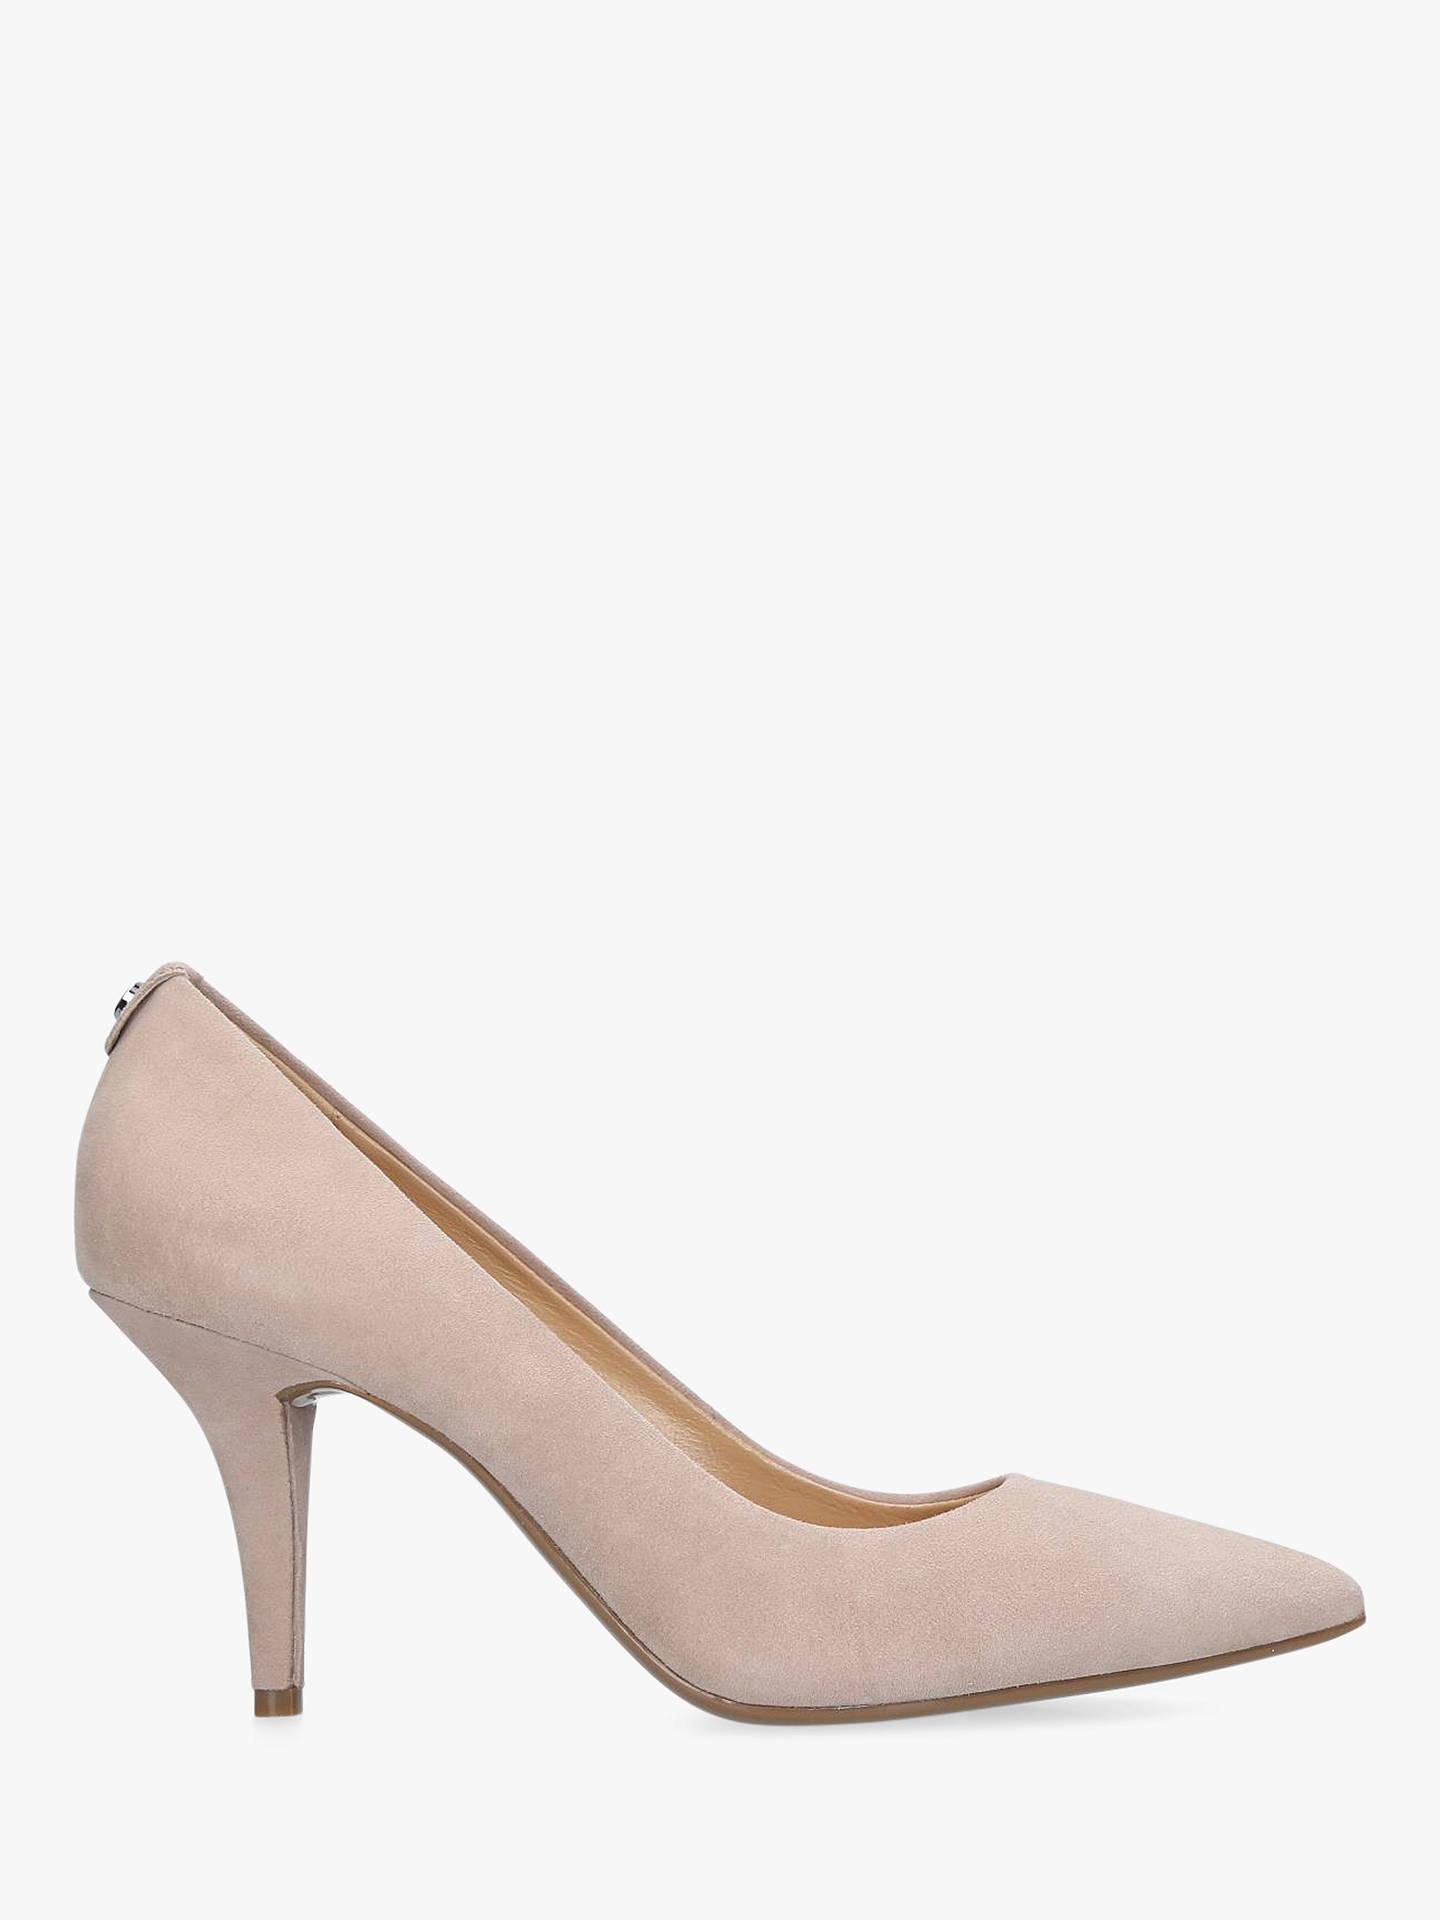 80d7a9a3883 MICHAEL Michael Kors Flex Pointed Court Shoes, Nude Suede at John ...